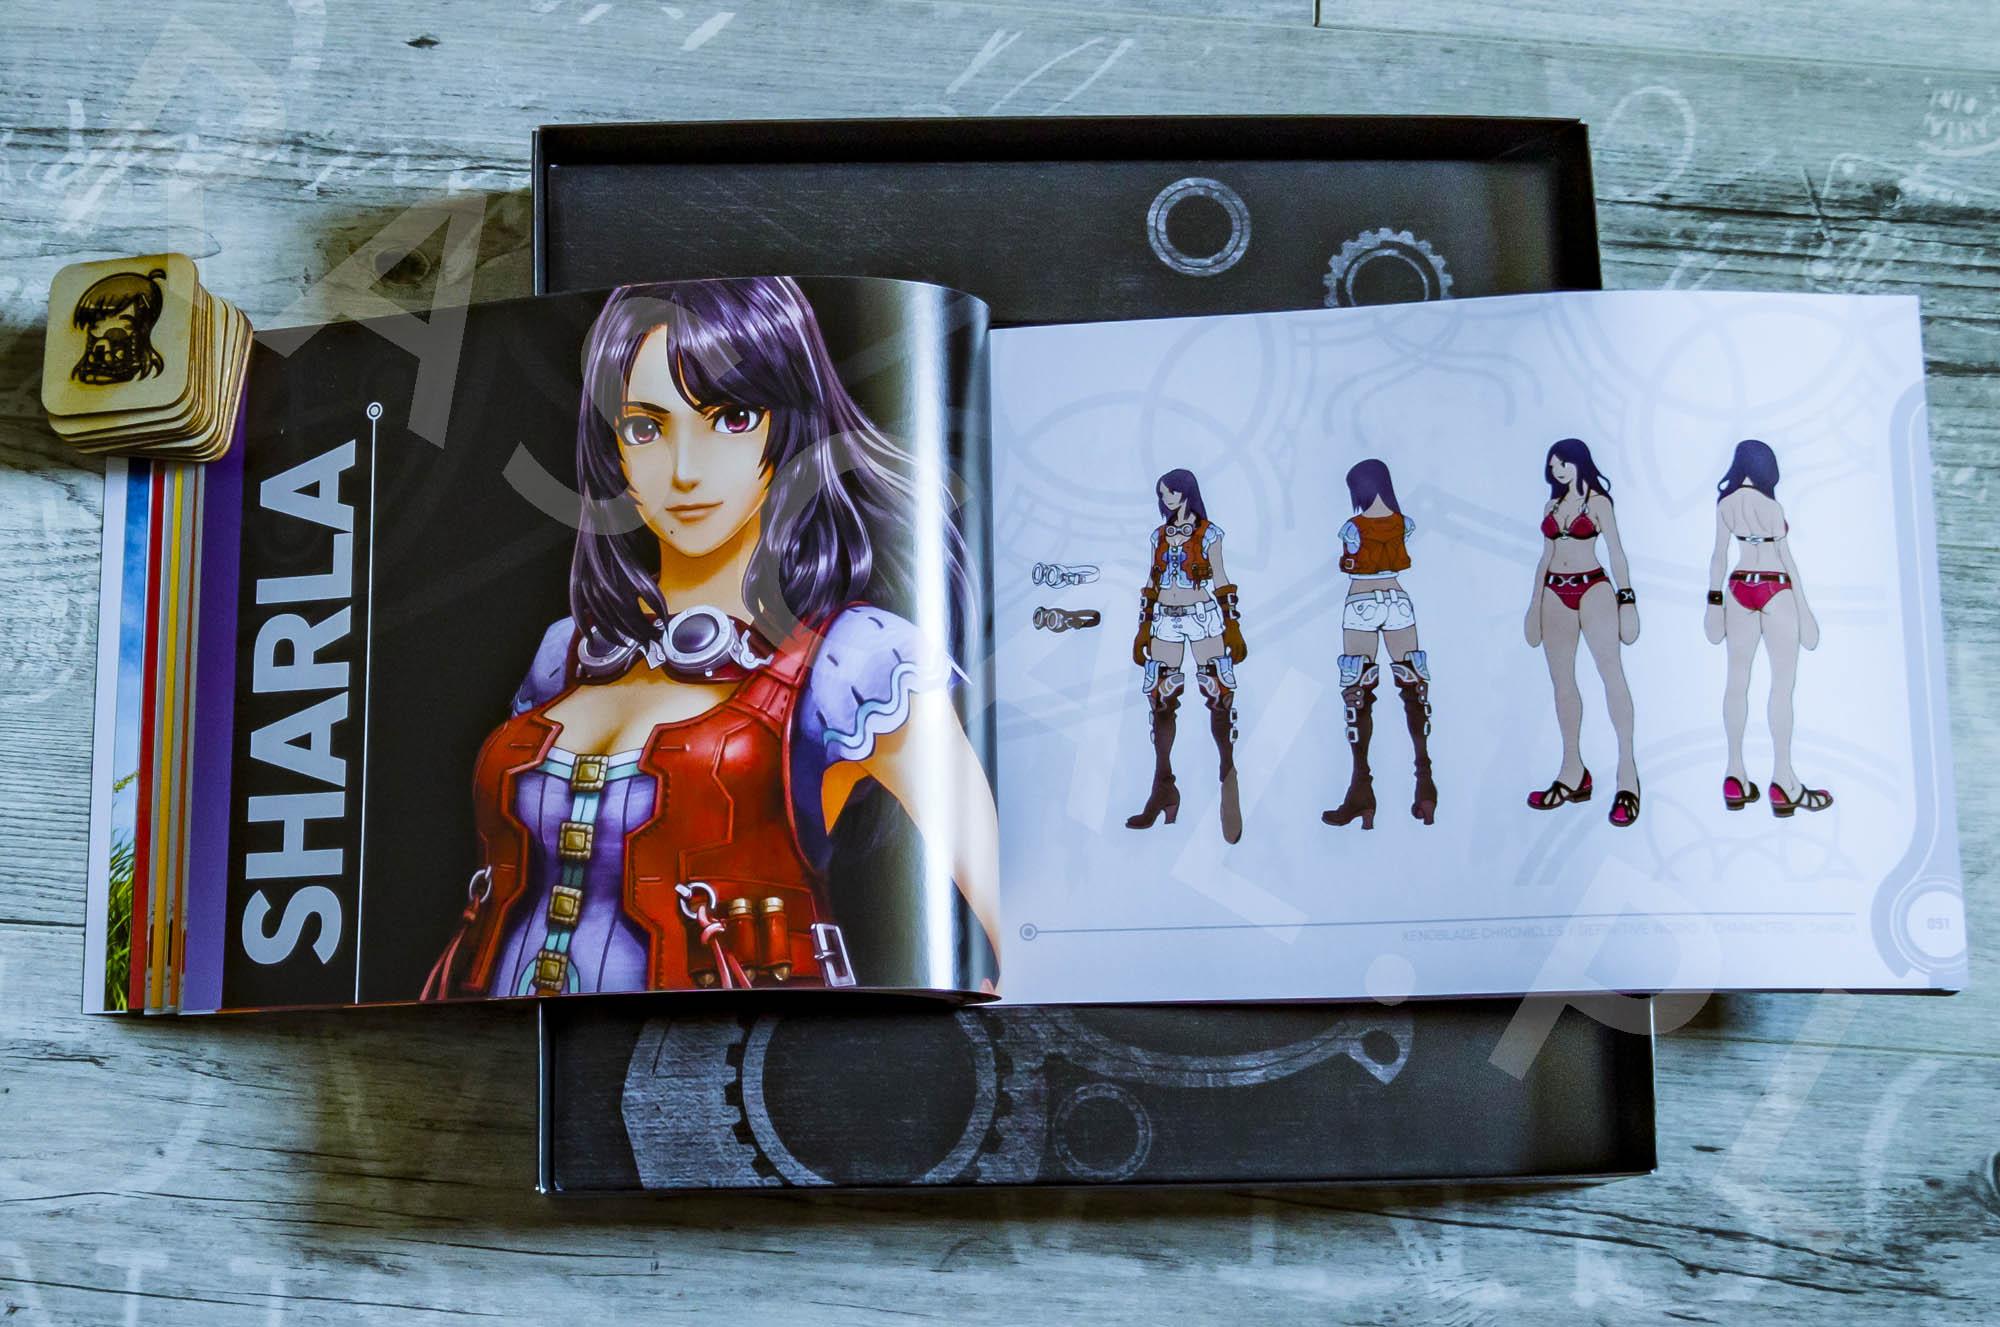 Xenoblade Chronicles Definitive Edition Collectors Set - Artbook - 06 - Carna